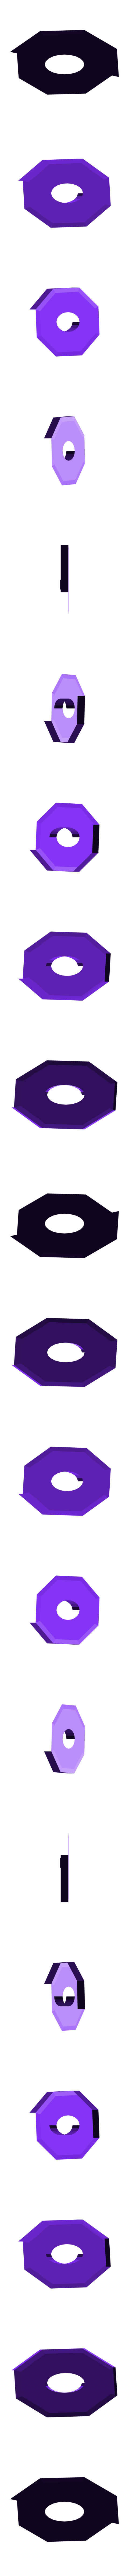 Katana_Guard.stl Download free STL file Training Mini Katana • 3D printer model, mrhers2